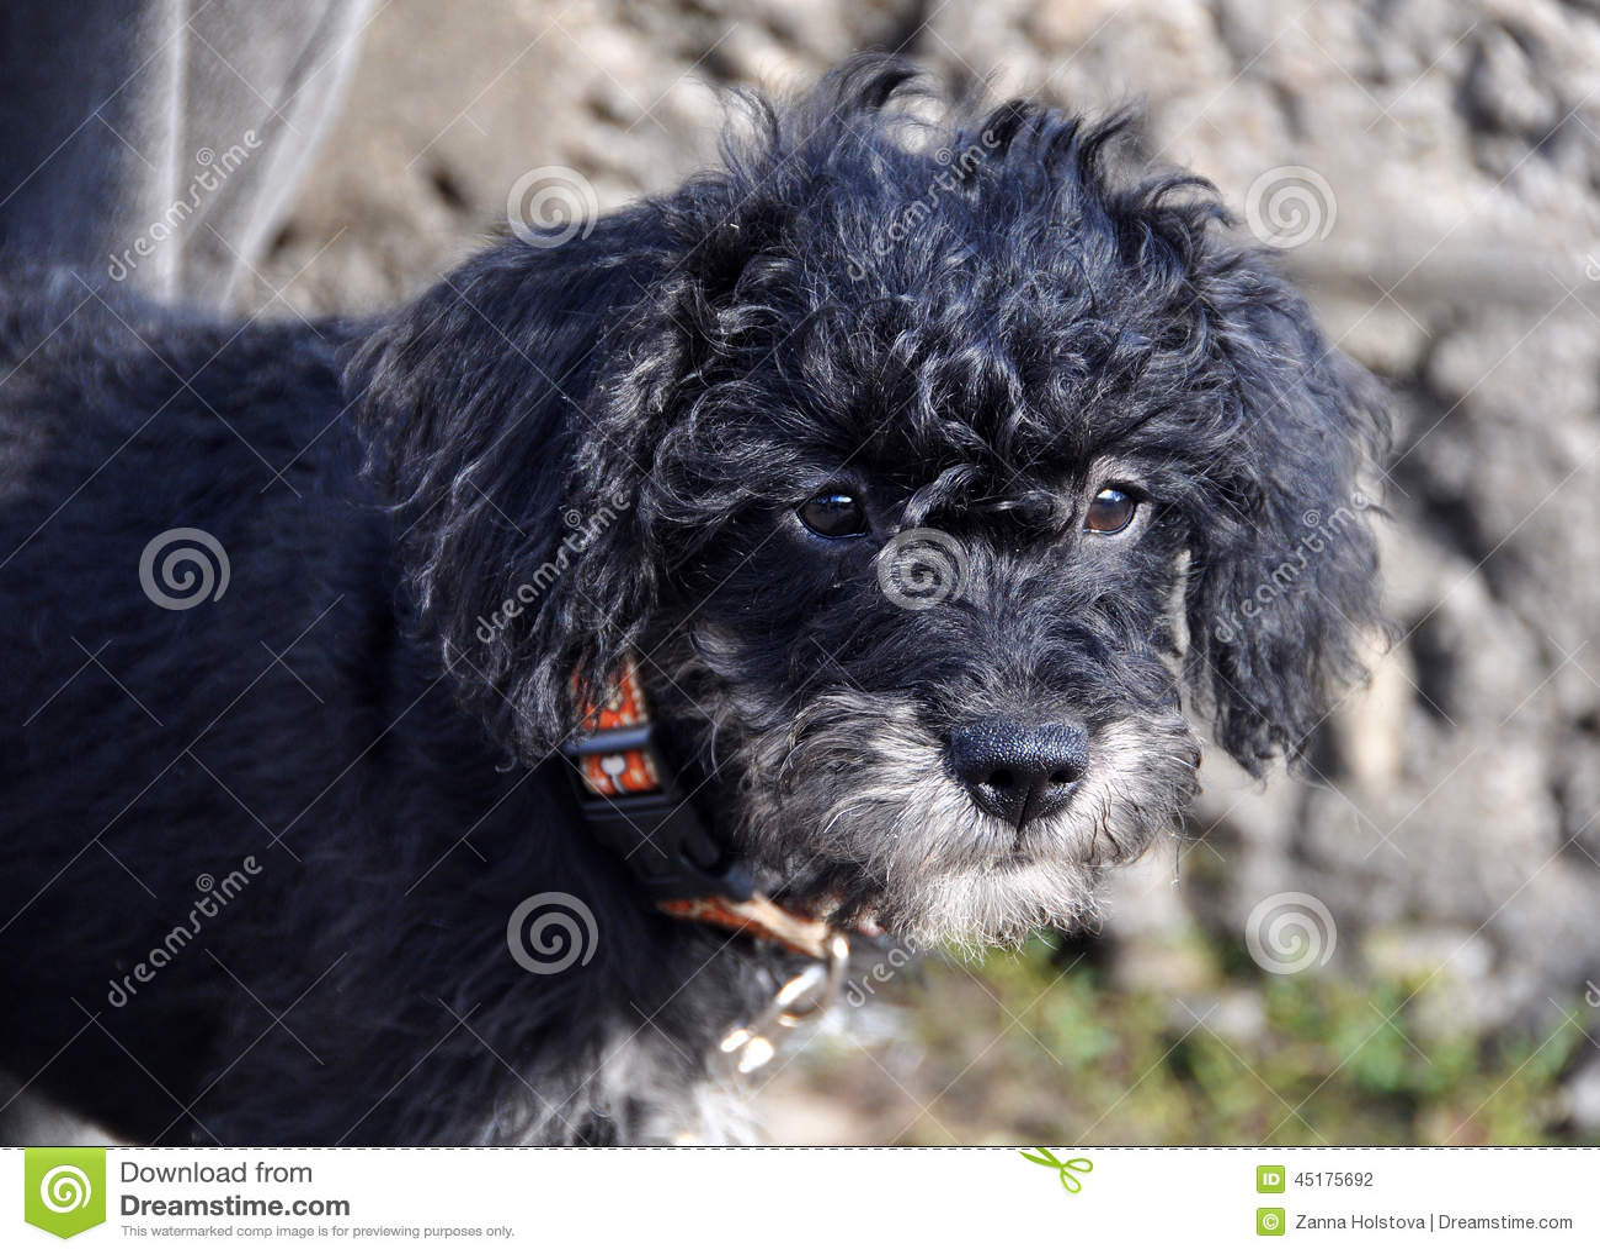 Black curly puppy